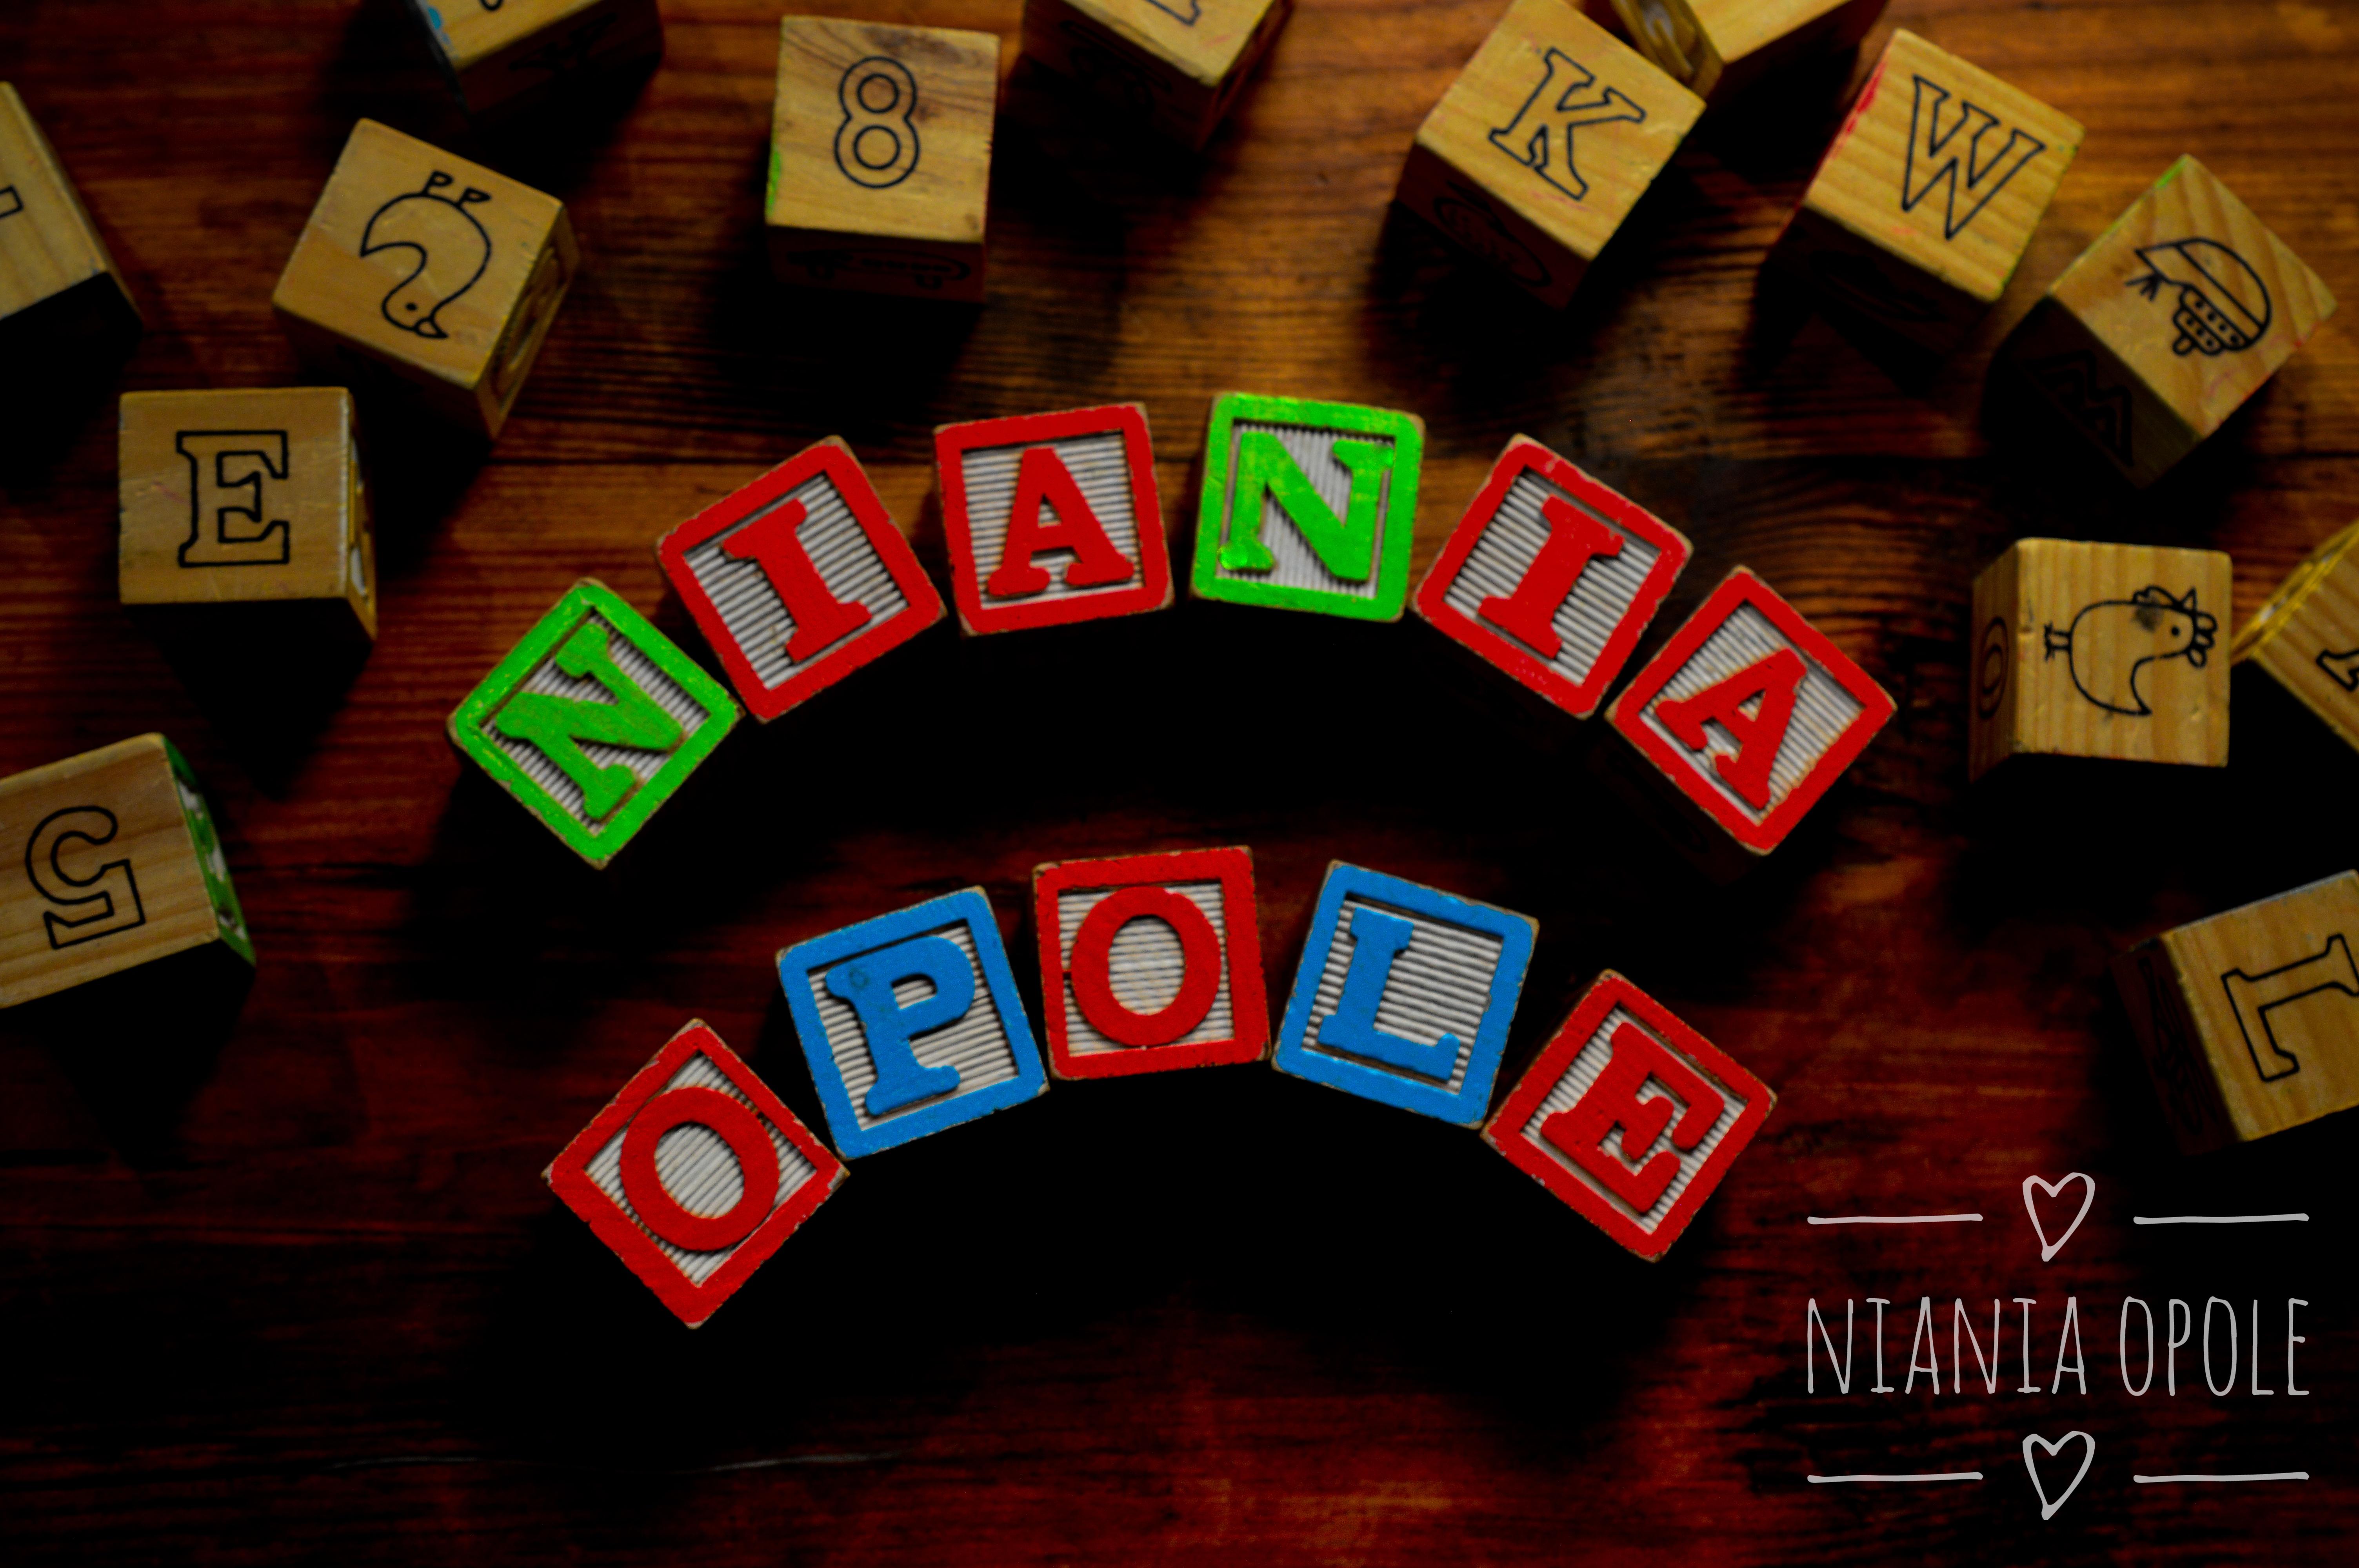 Niania Opole